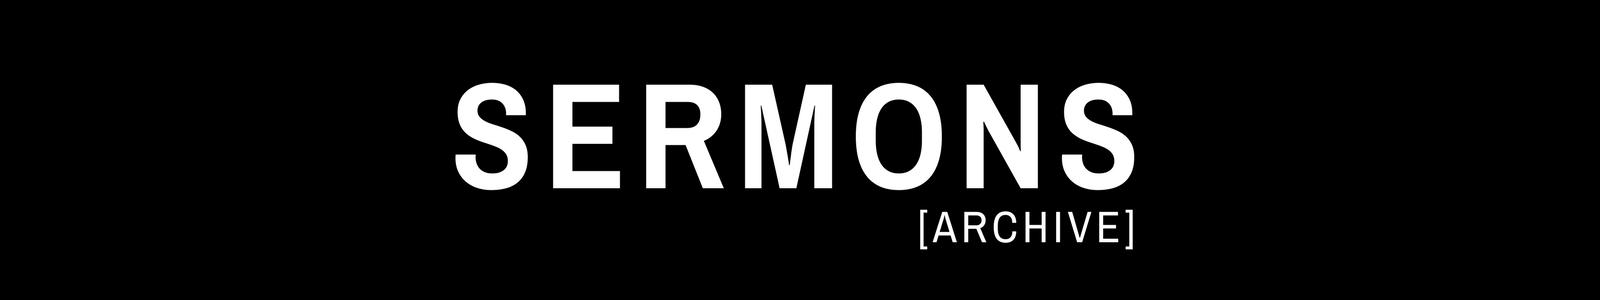 SERMONS (1).png